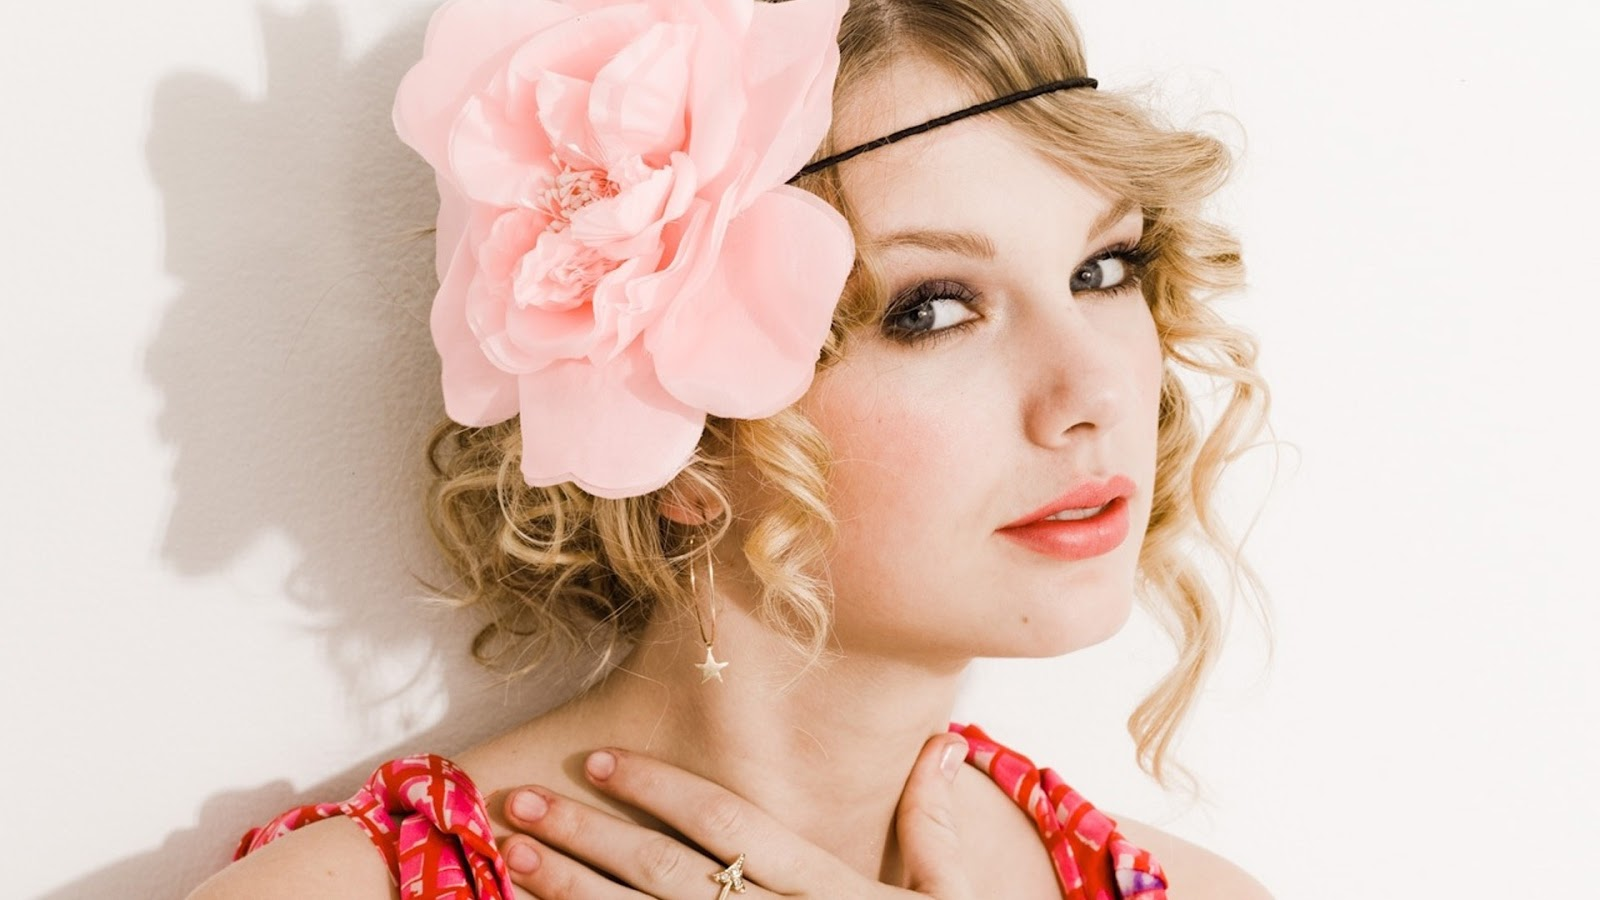 Lovely Taylor Swift Wallpaper